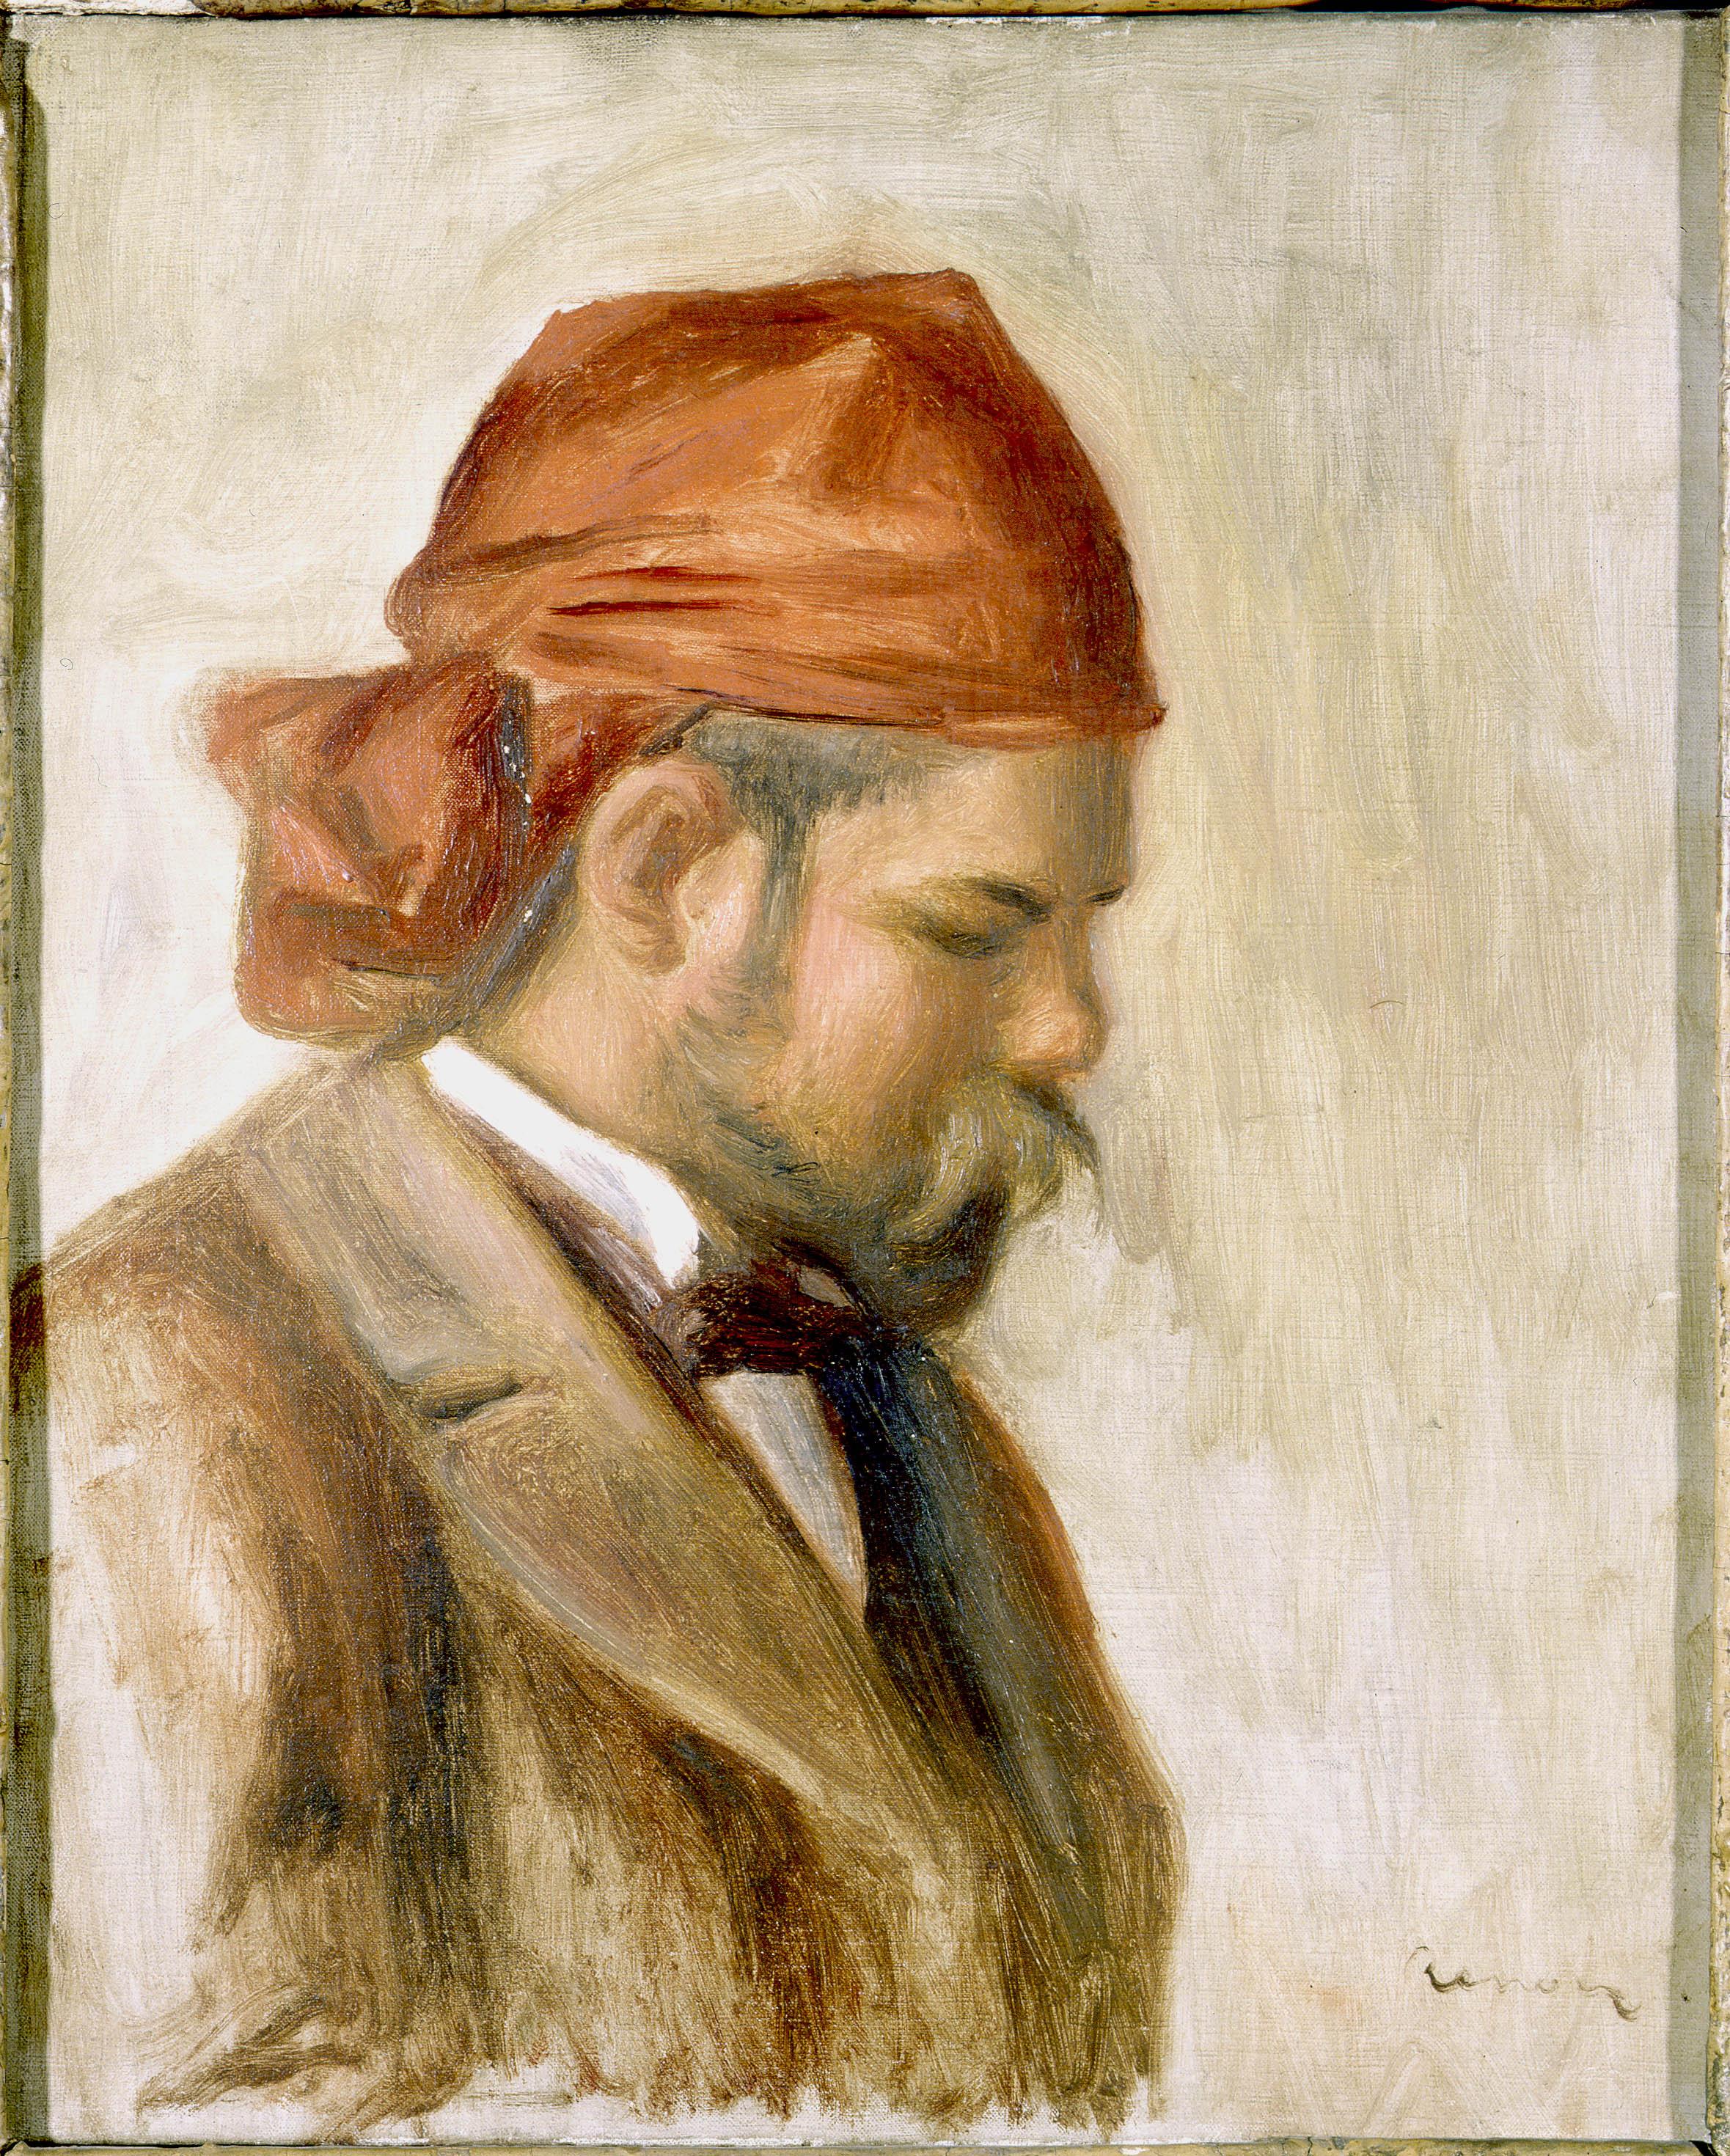 Pierre-Auguste Renoir - Ambroise Vollard in a Red Scarf